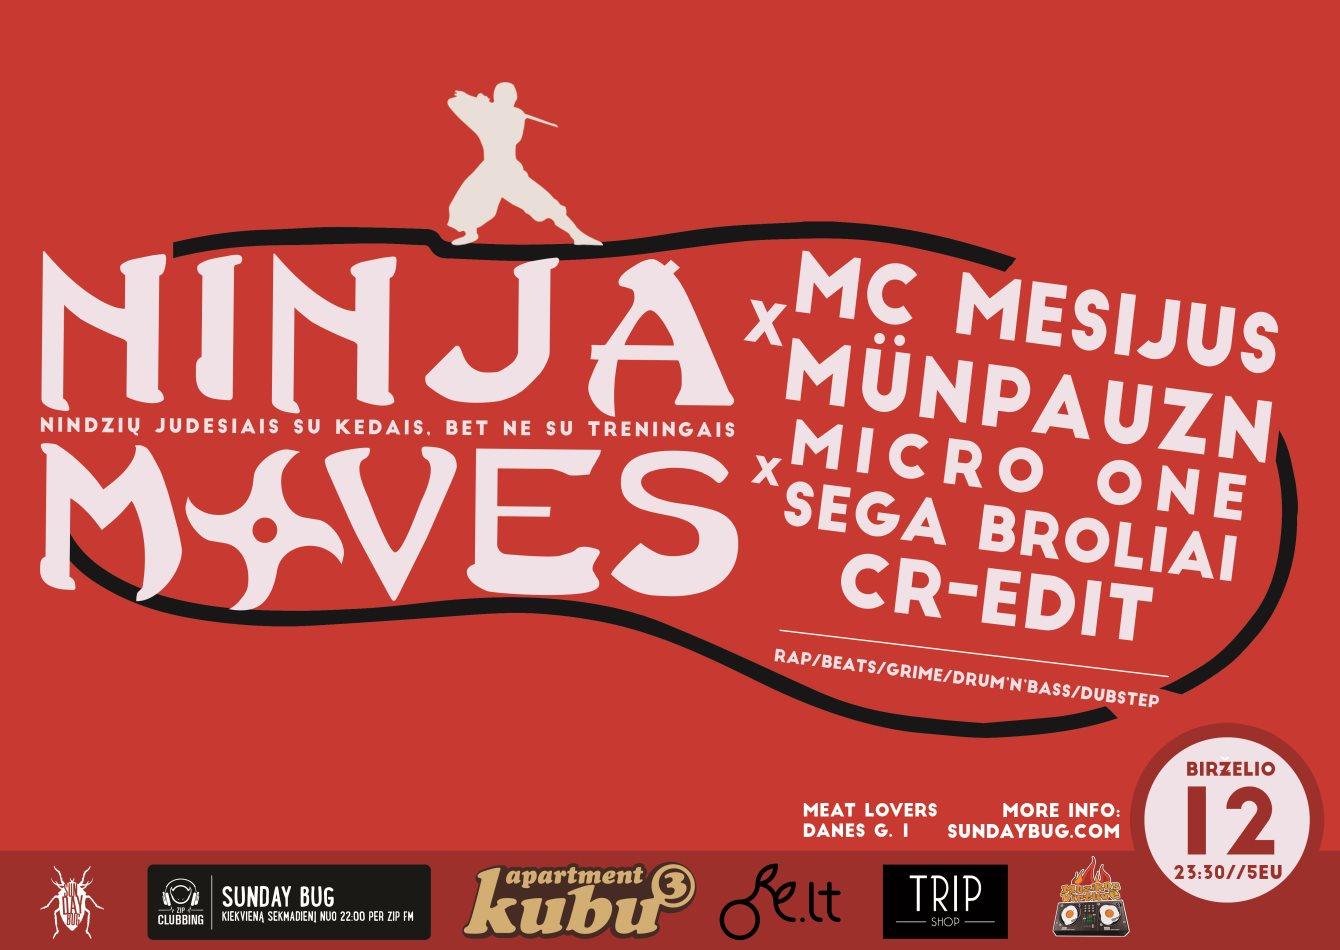 Ninja Moves with MC Mesijus x Münpauzn - Flyer front